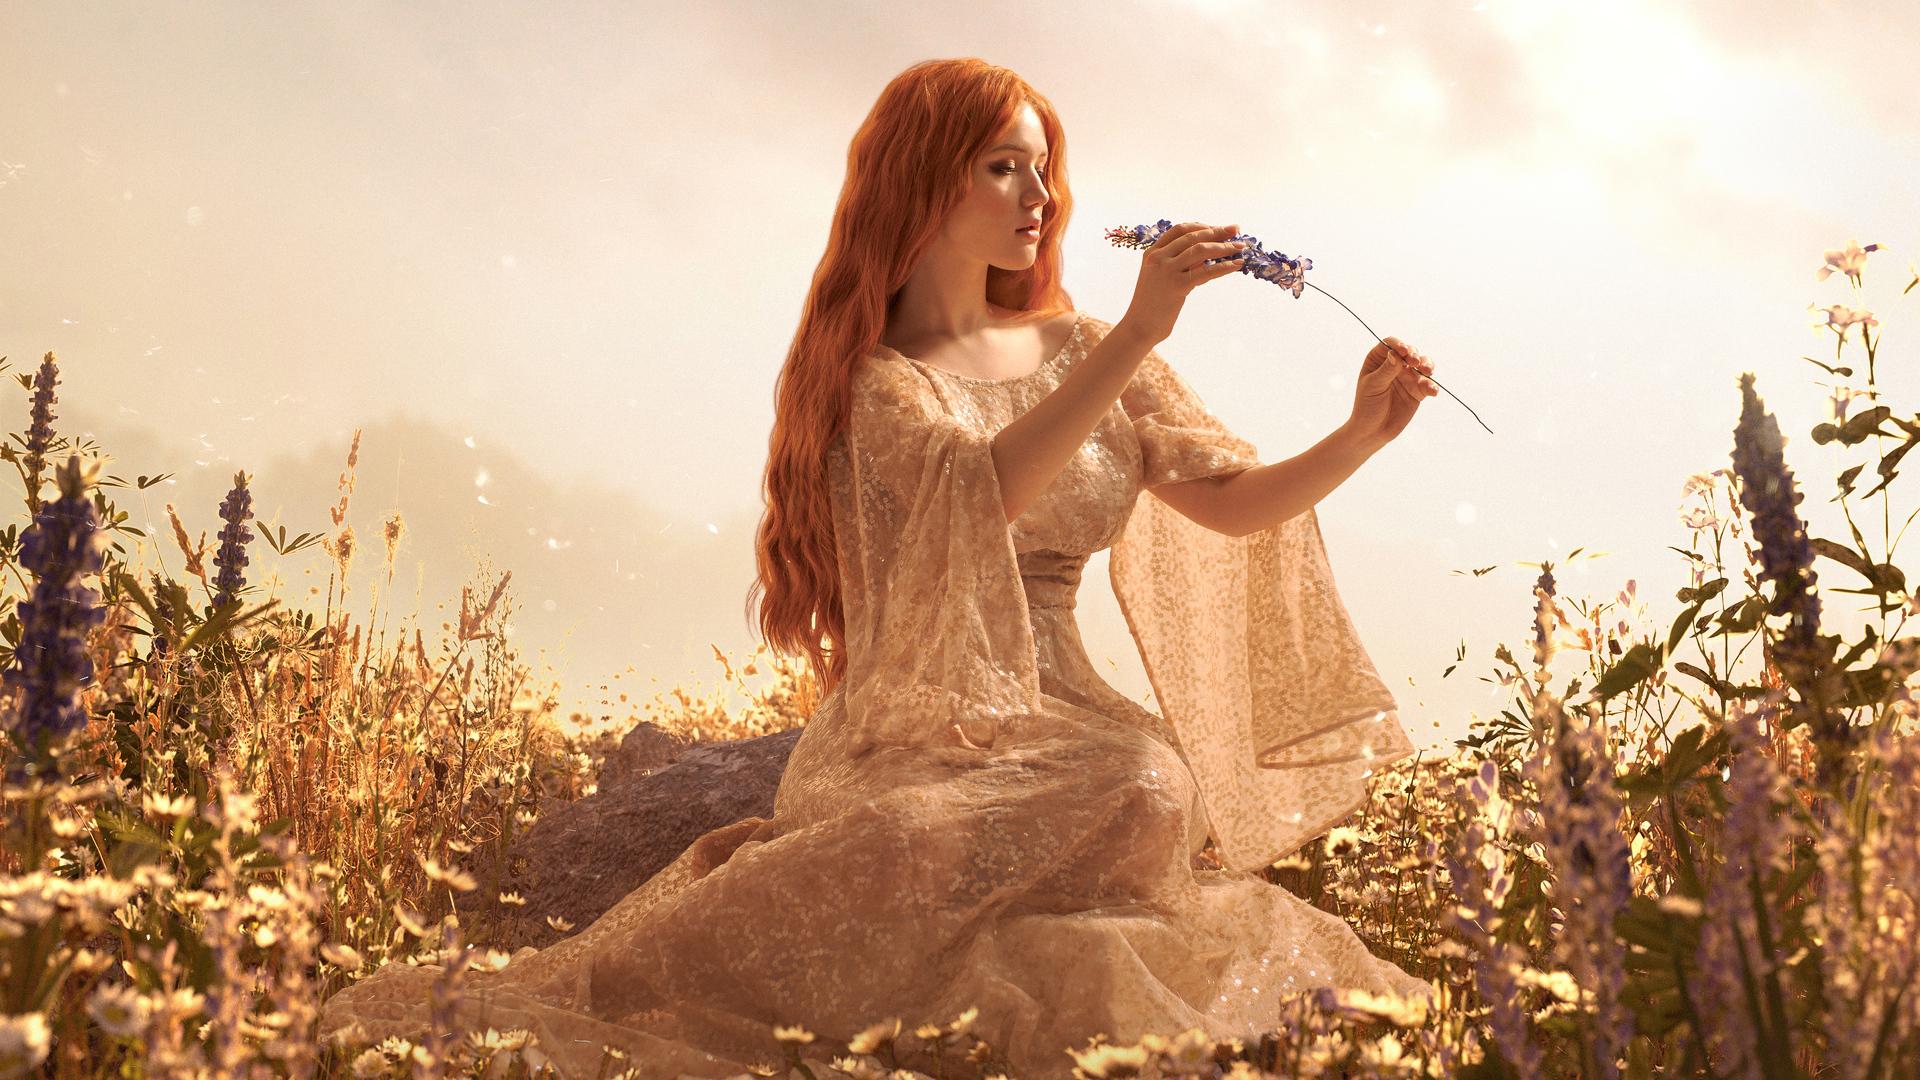 beautiful-girl-redhead-cosplay-8k-vp.jpg